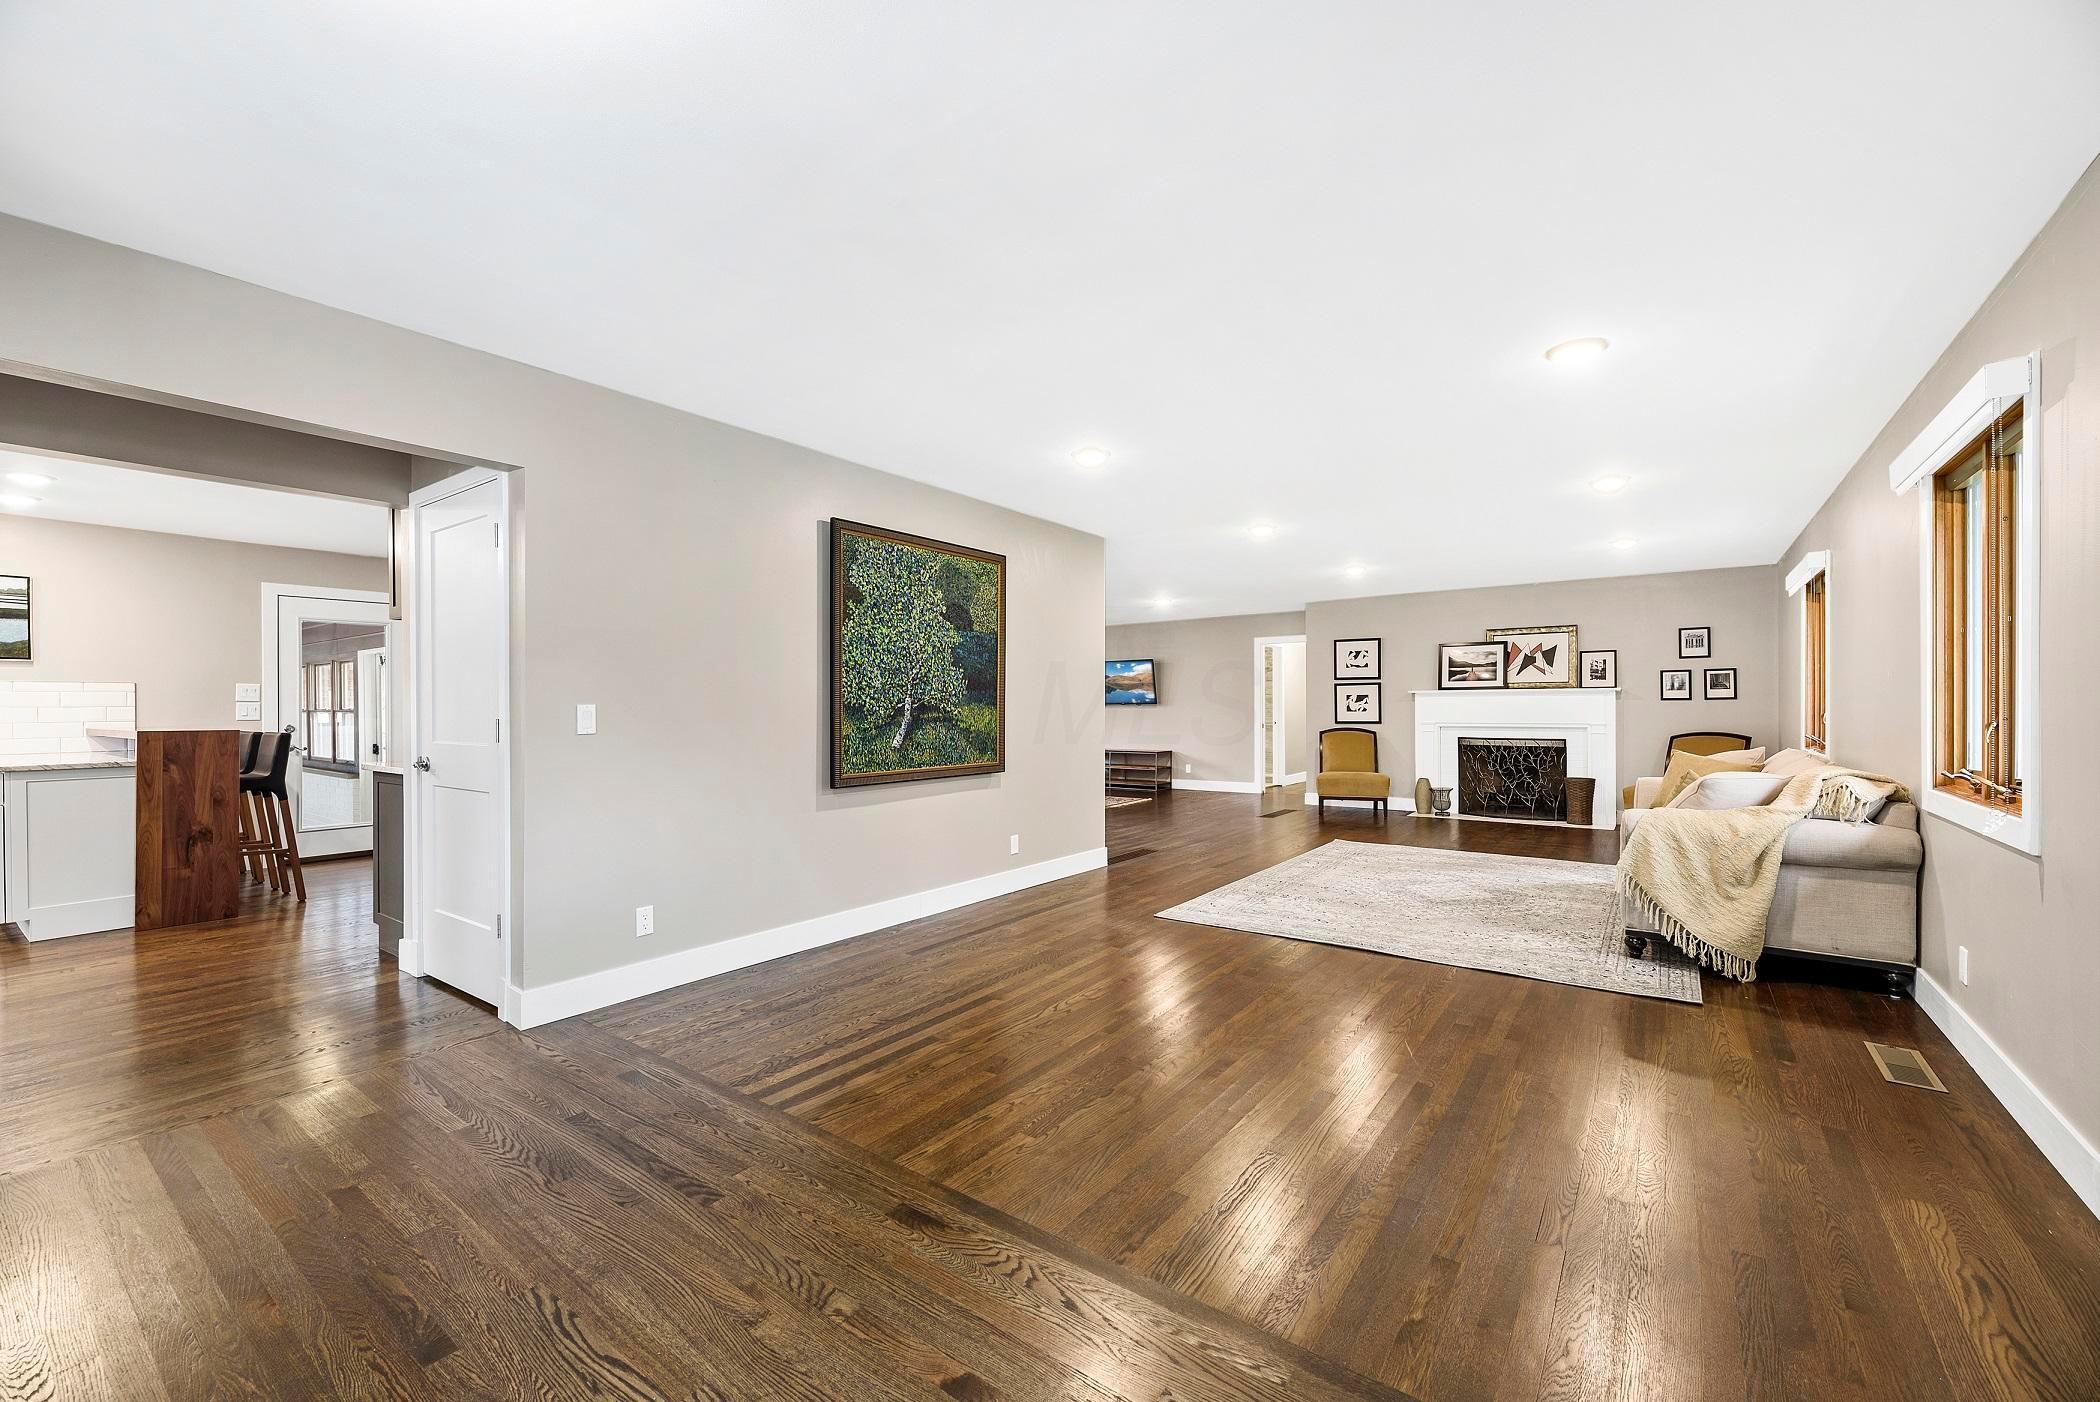 1610 Pemberton Drive, Columbus, Ohio 43221, 3 Bedrooms Bedrooms, ,3 BathroomsBathrooms,Residential,For Sale,Pemberton,220038385